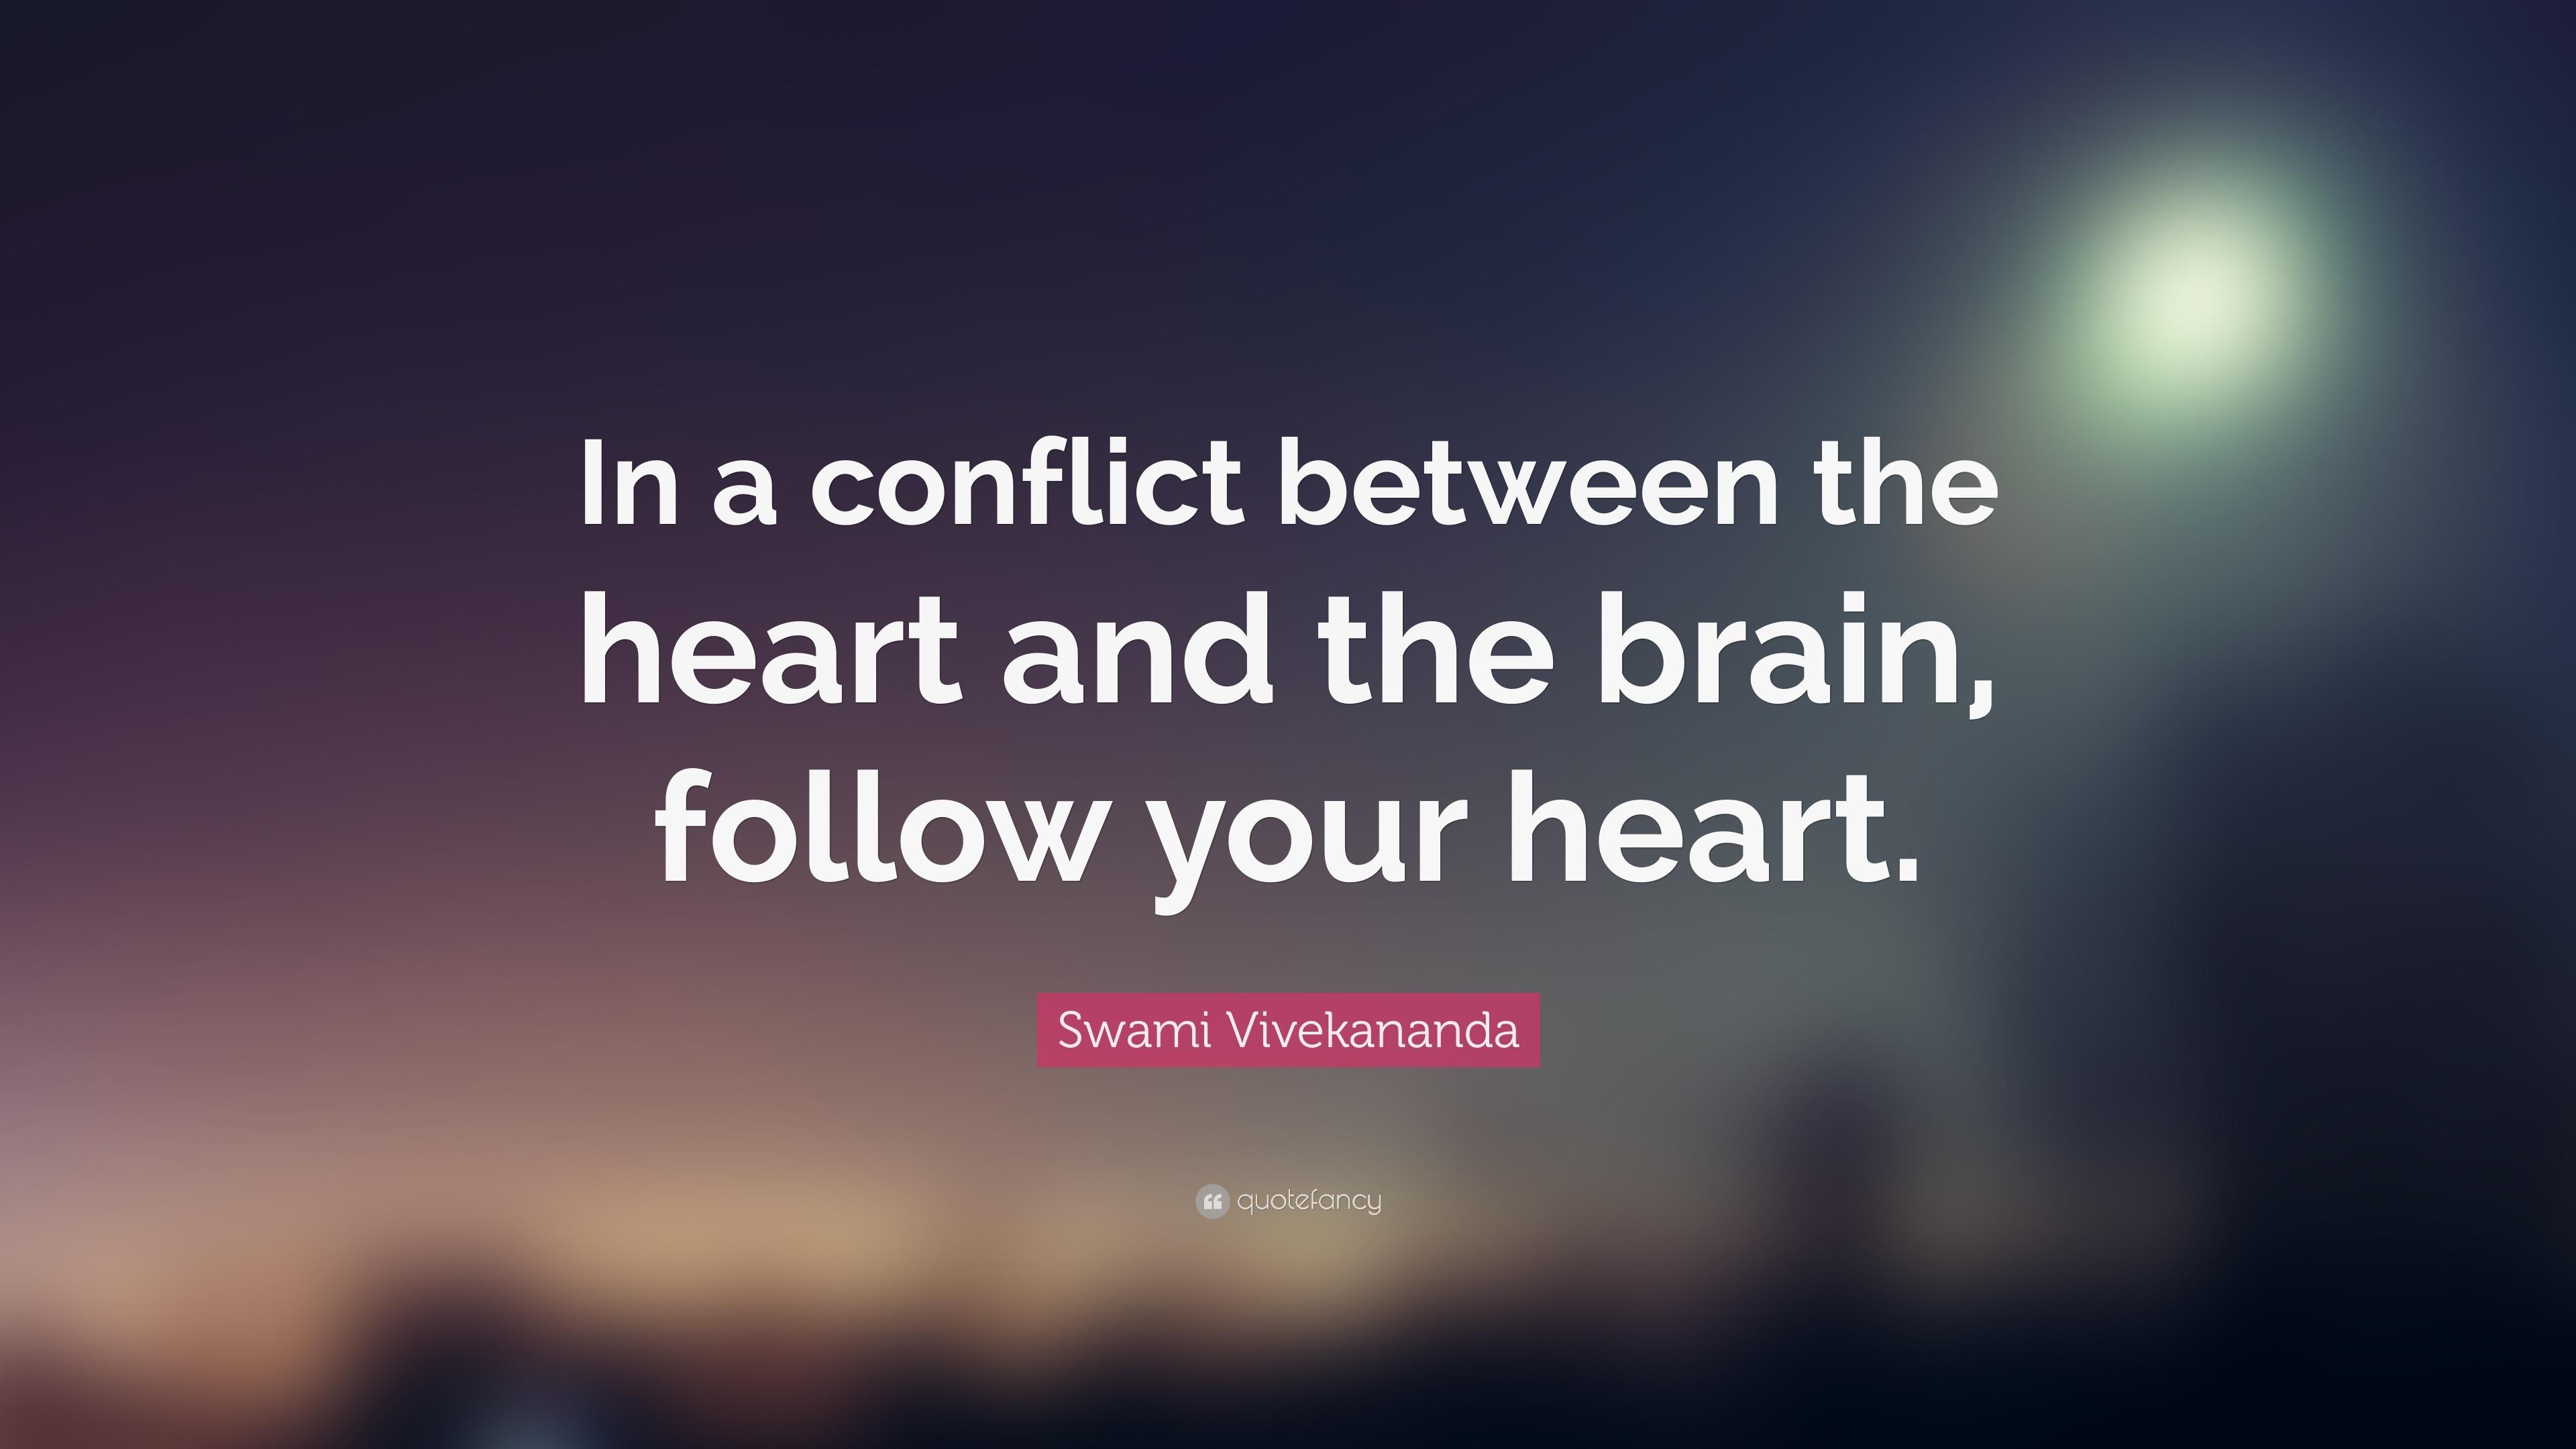 Swami Vivekananda Quote In A Conflict Between The Heart